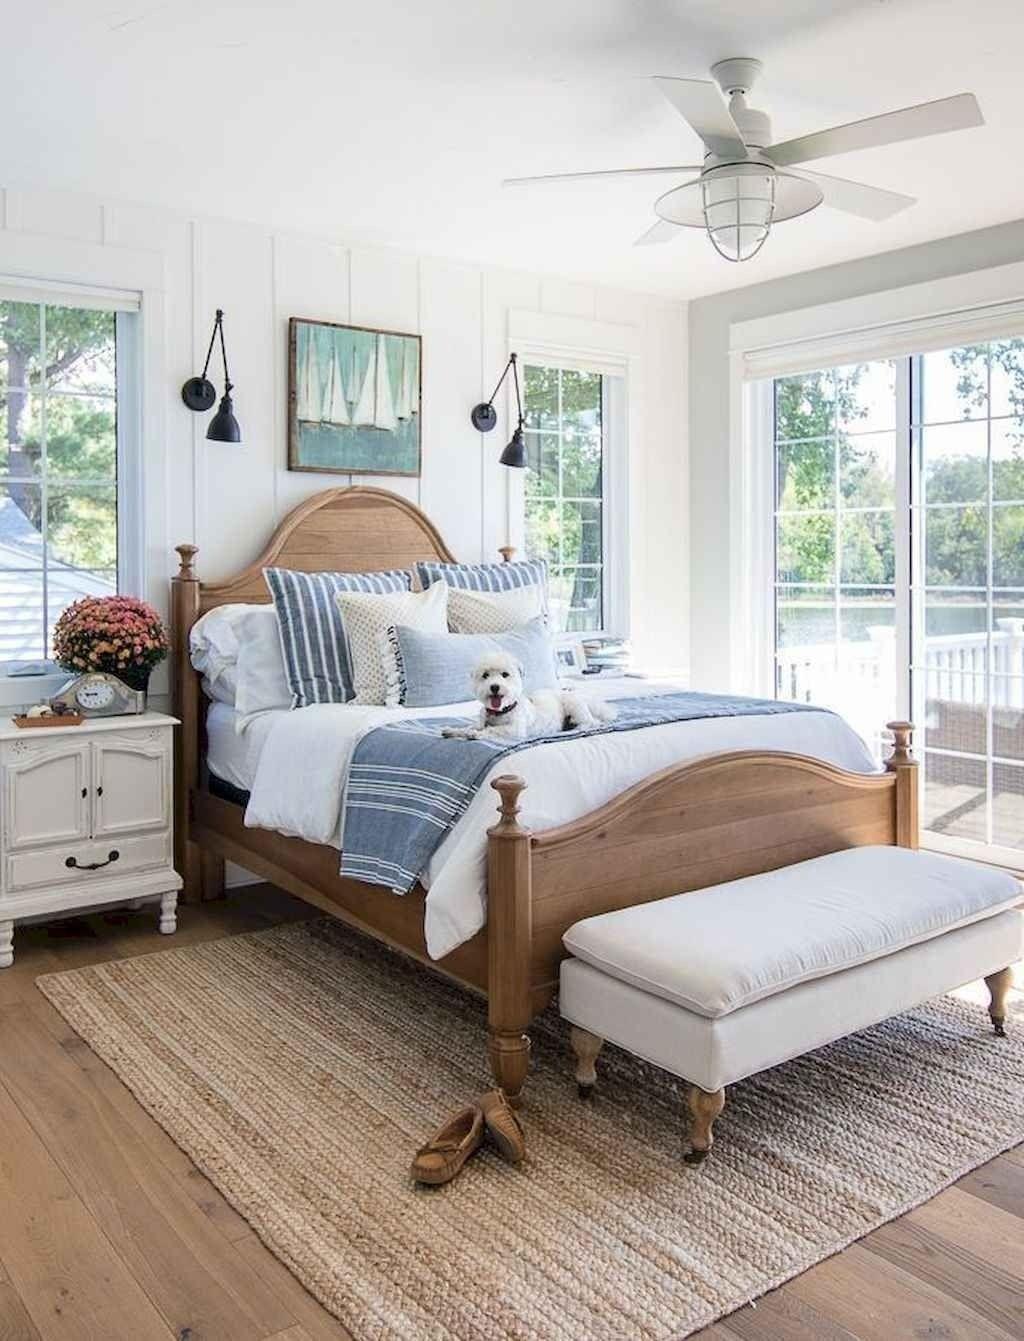 Small Master Bedroom Design with Elegant Style #coastalbedrooms